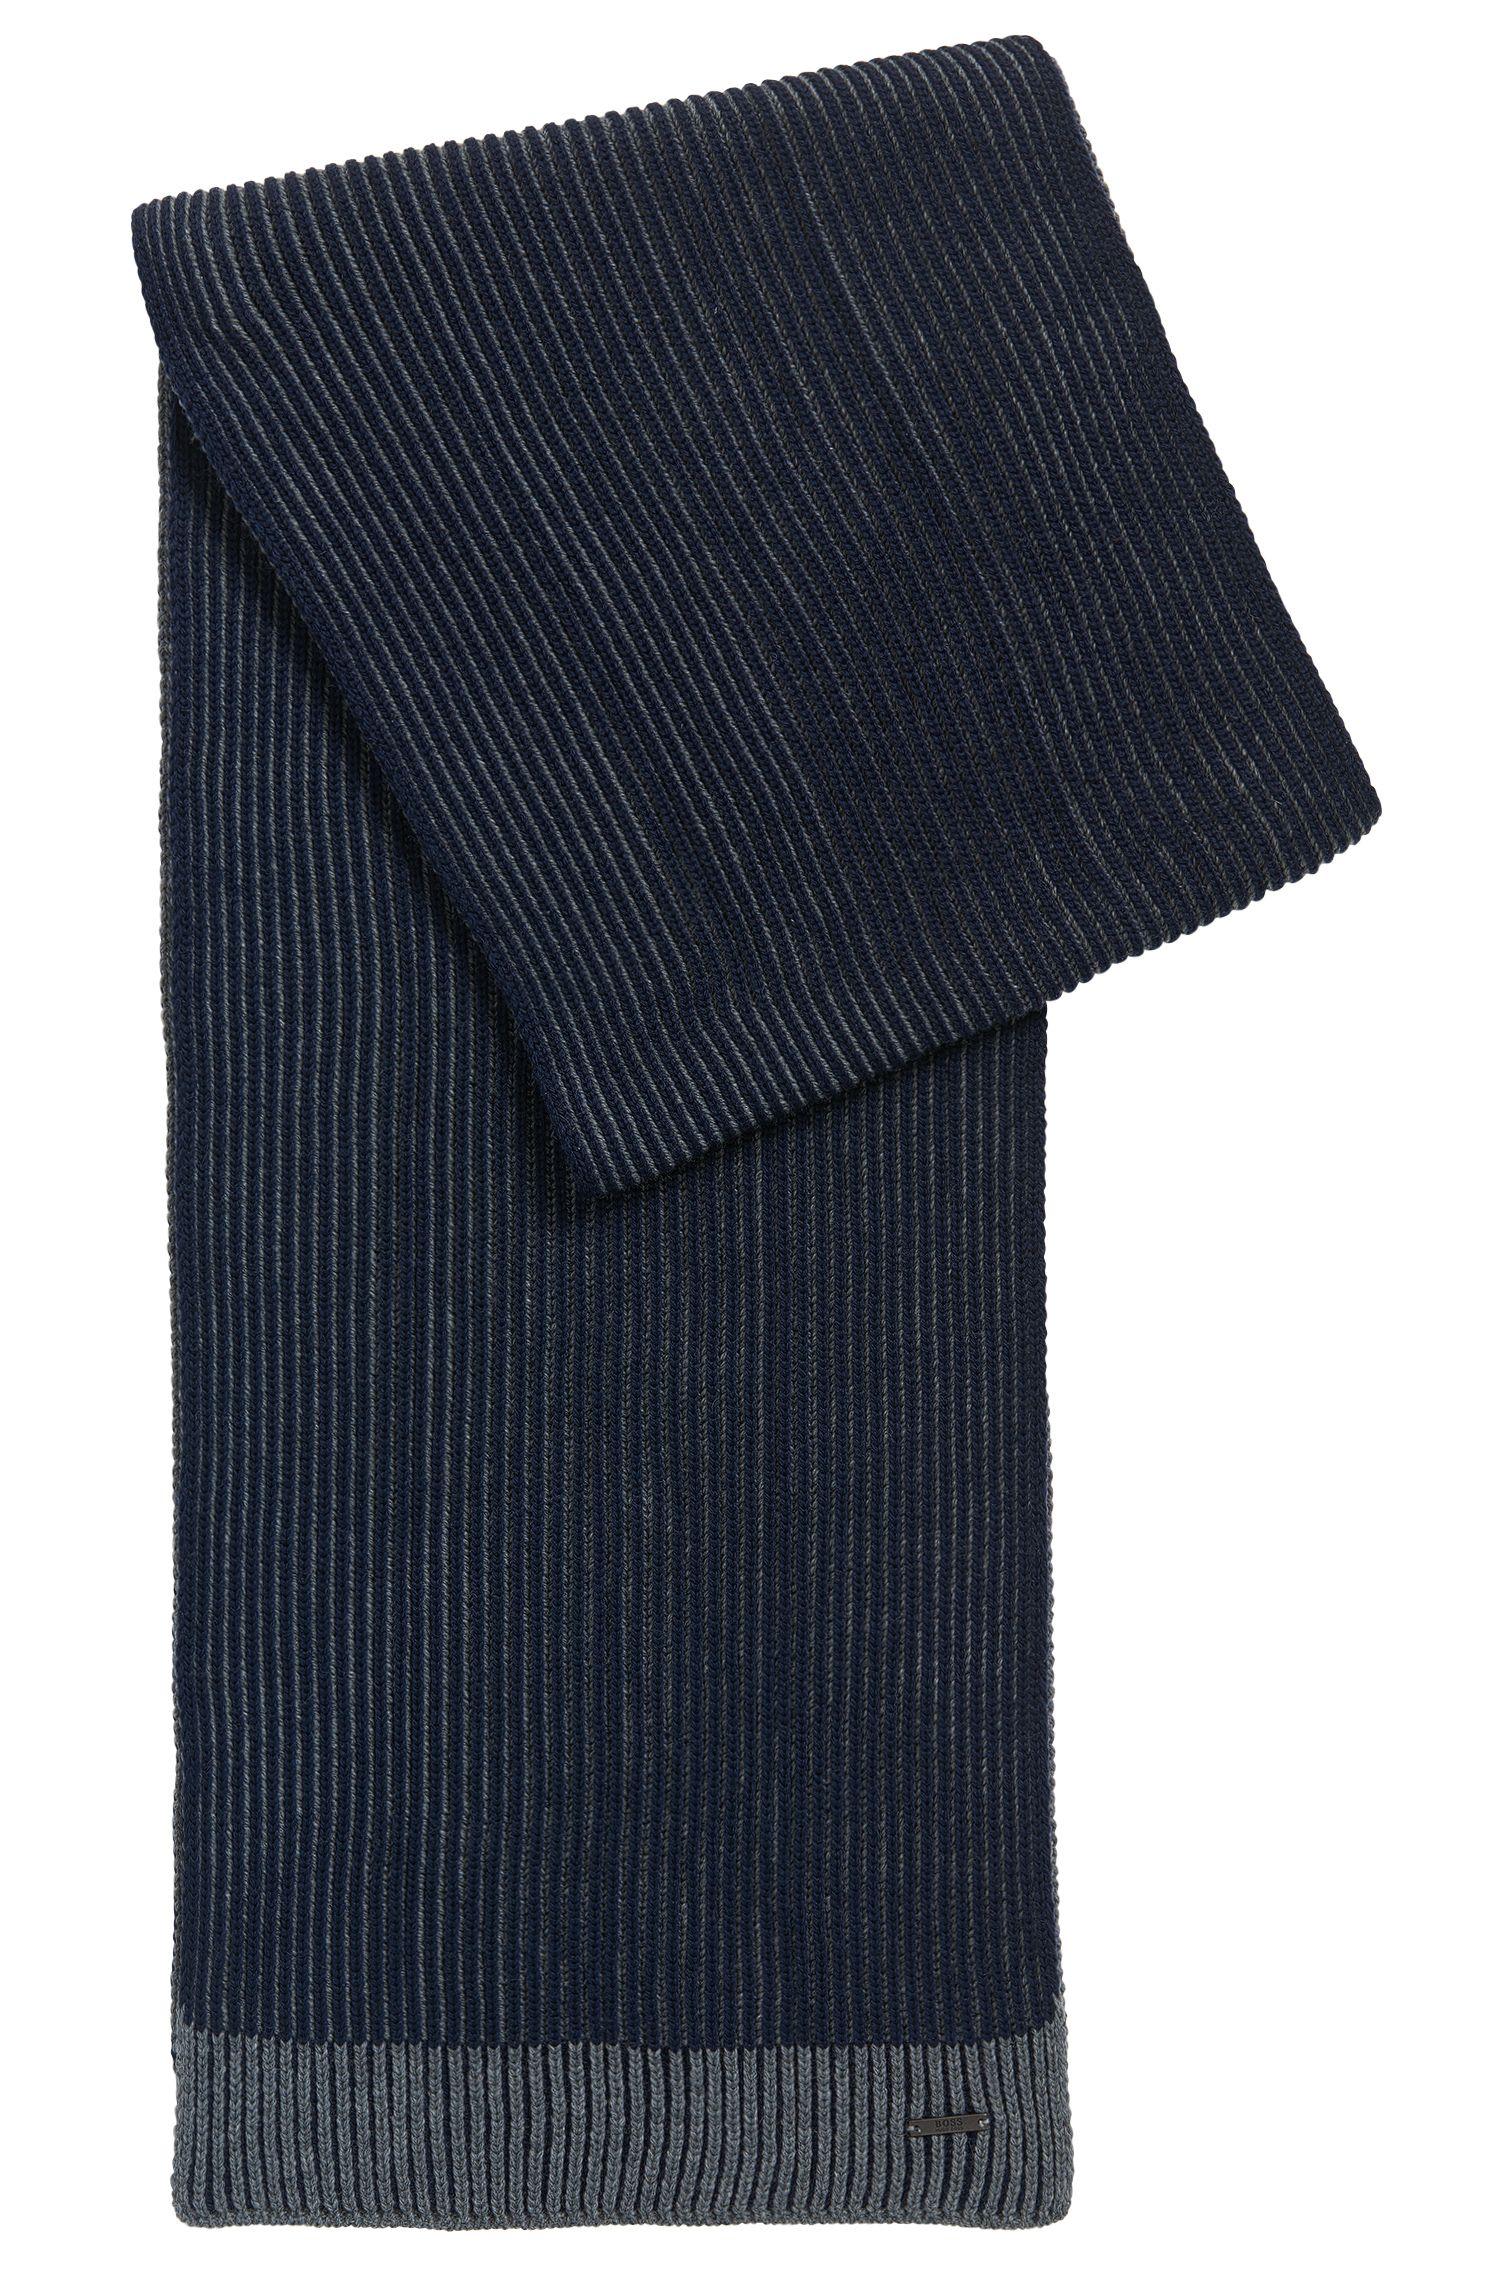 'Balios WS' | Textured Merino Wool Scarf